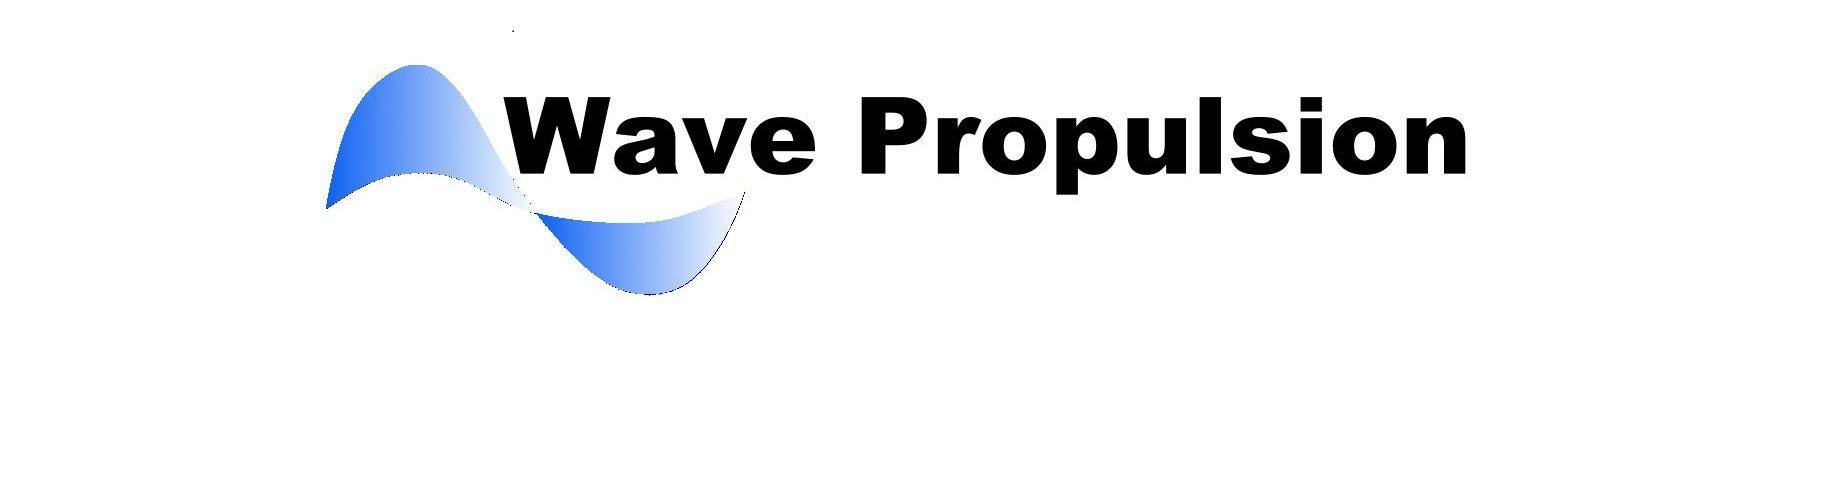 Wave Propulsion